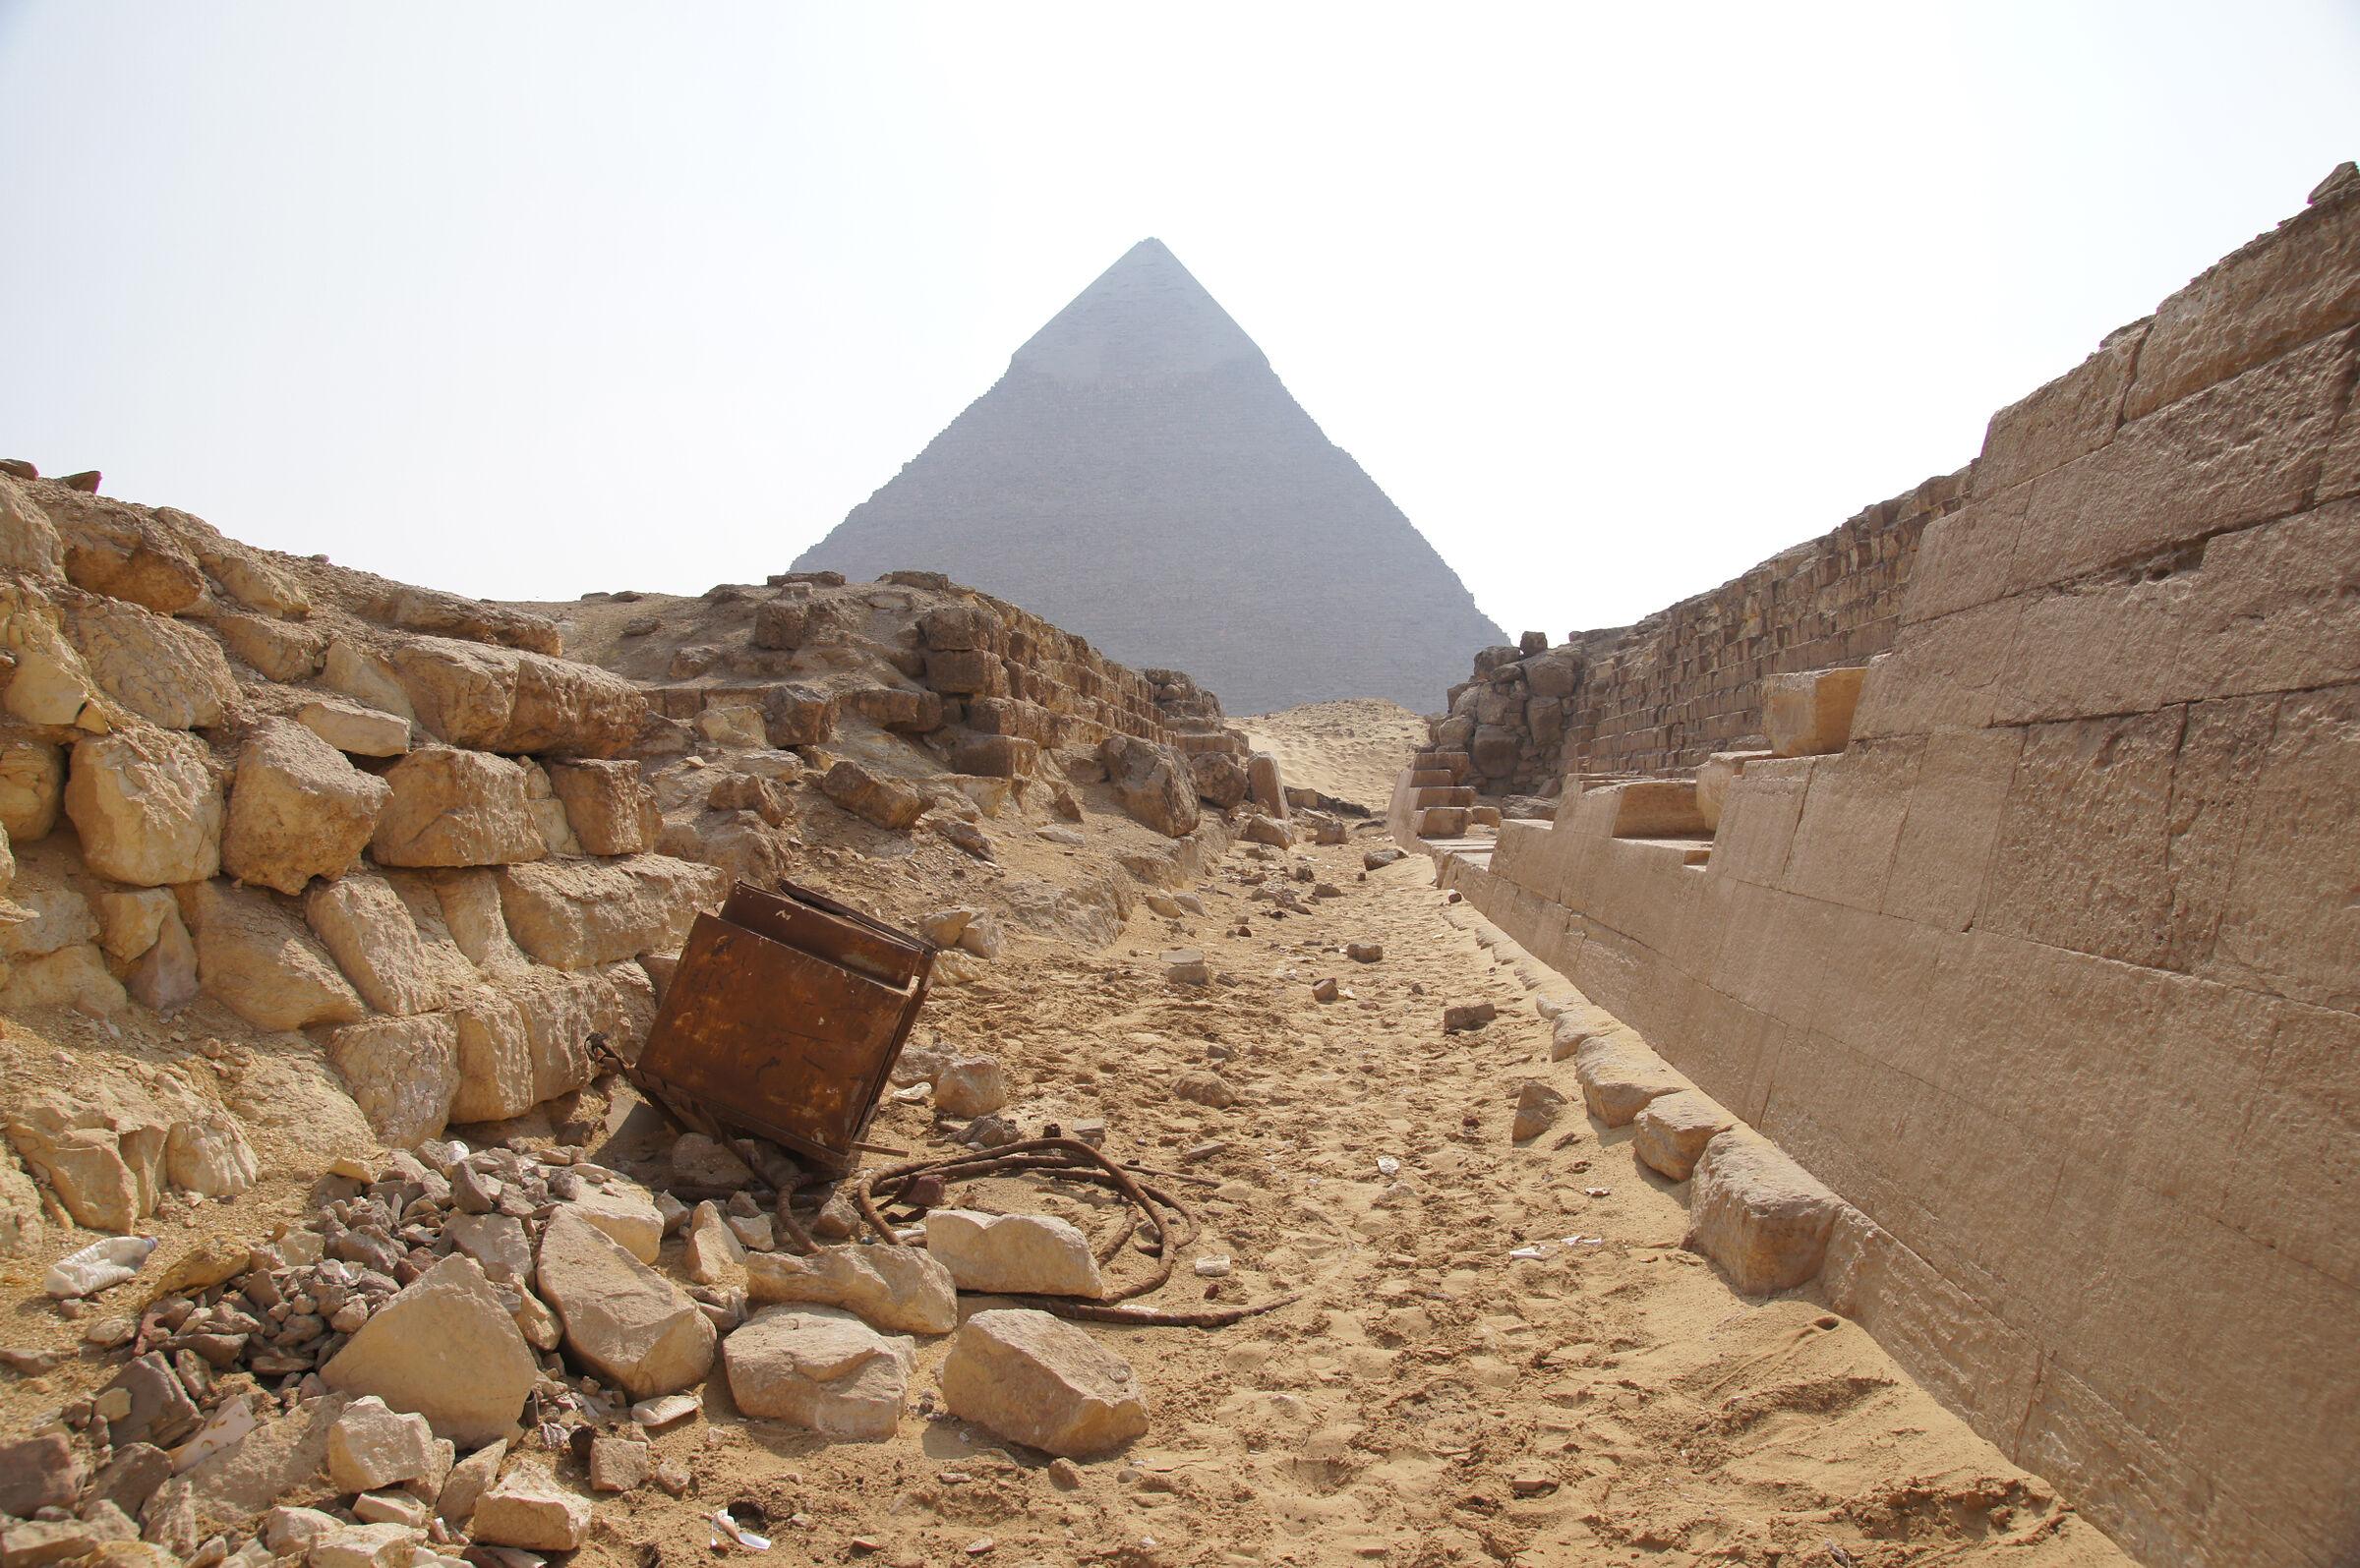 Western Cemetery: Site: Giza; View: G 4140, G 4150, G 4160, G 4000, Khafre Pyramid